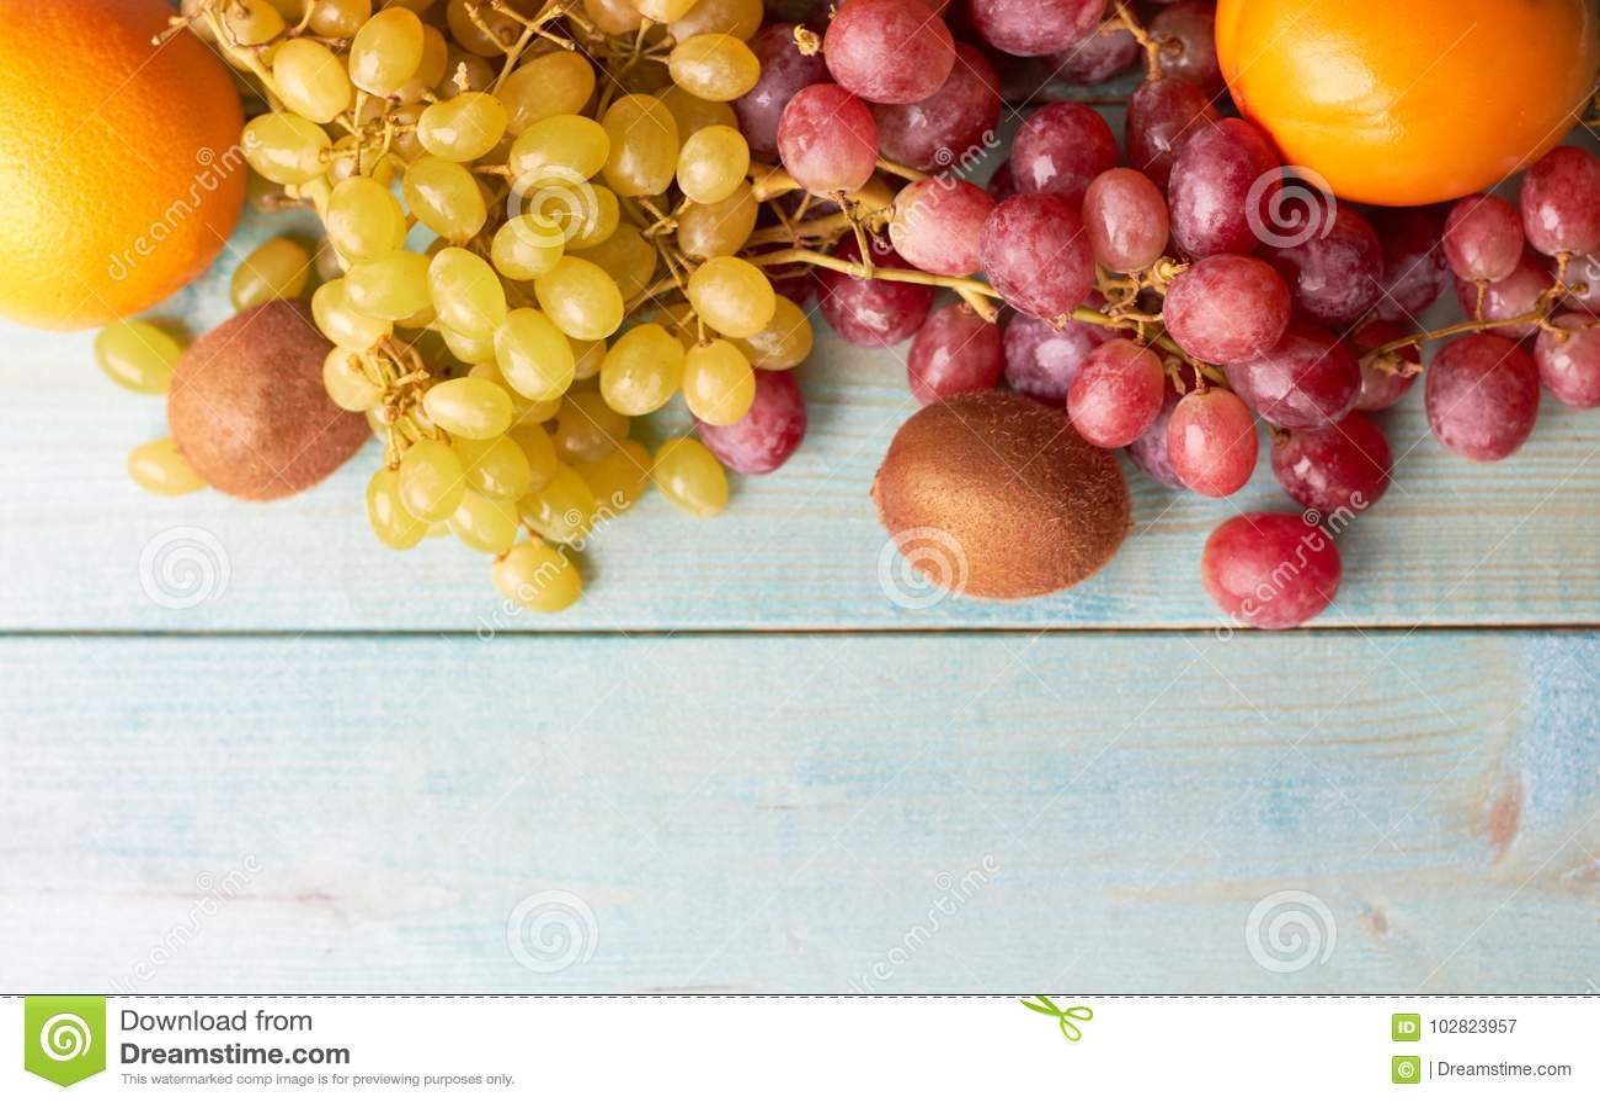 Fundo de frutos suculentos